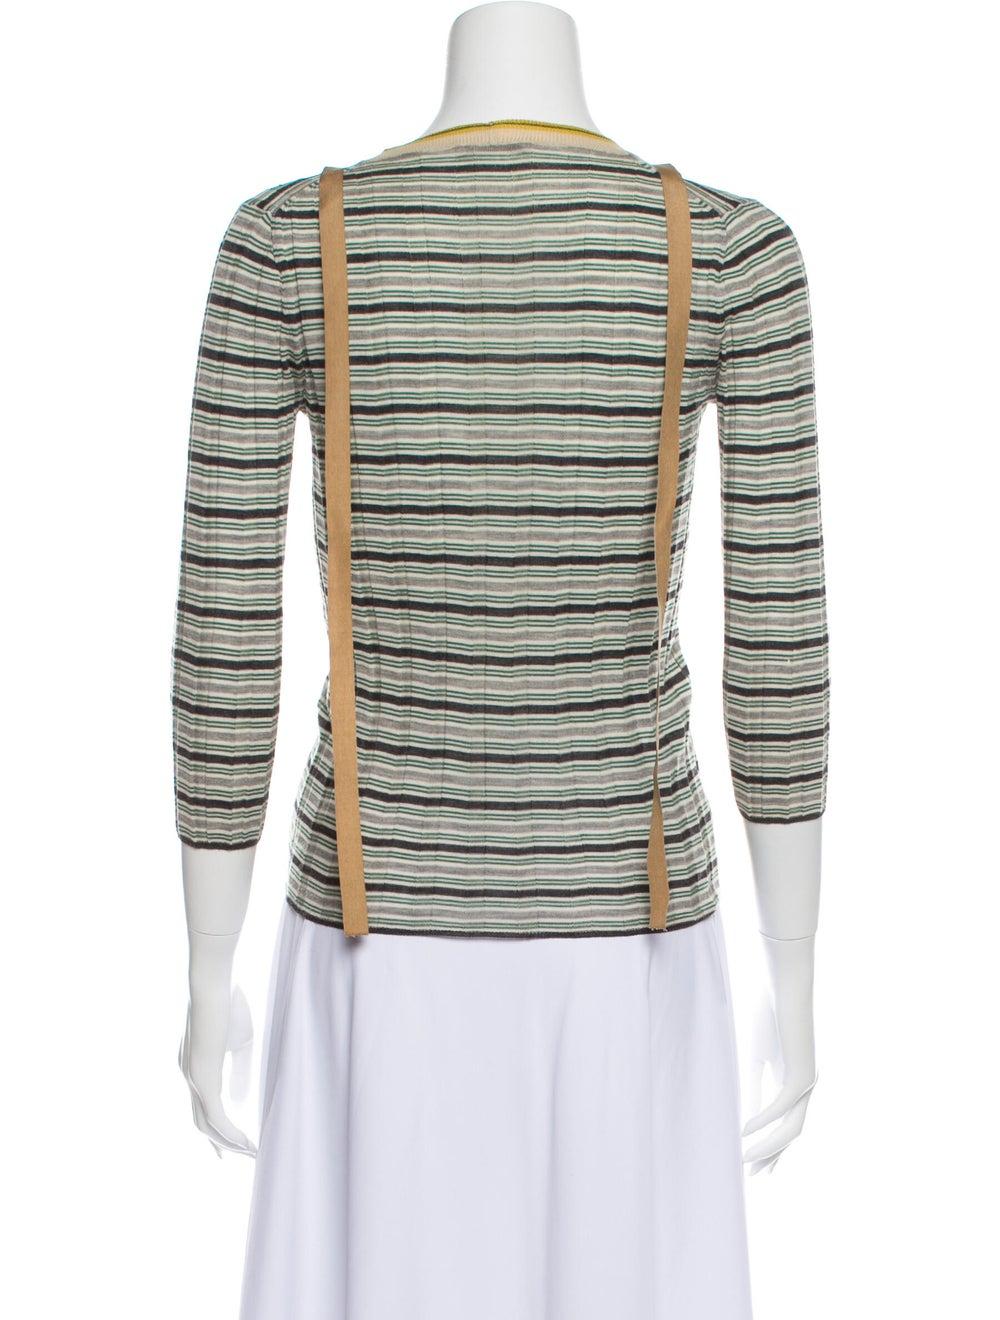 Prada Wool Striped Sweater Wool - image 3